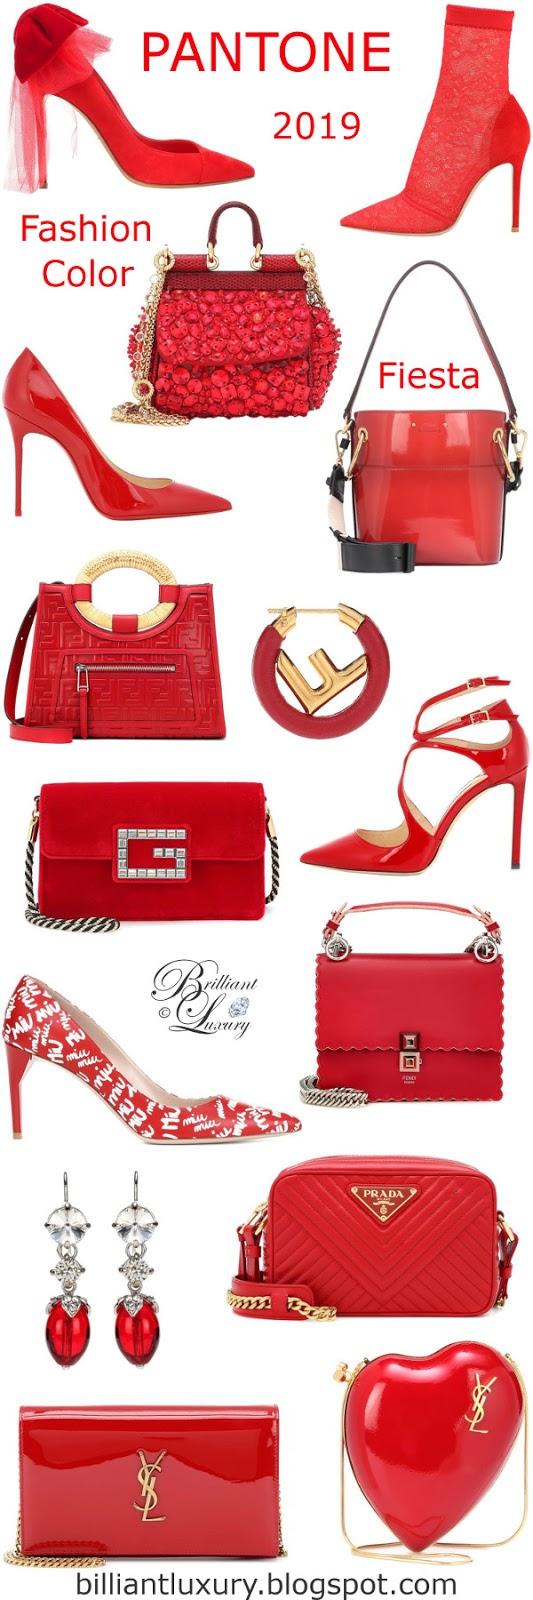 Brilliant Luxury ♦ PANTONE Fashion Color SS 2019 ~ Fiesta